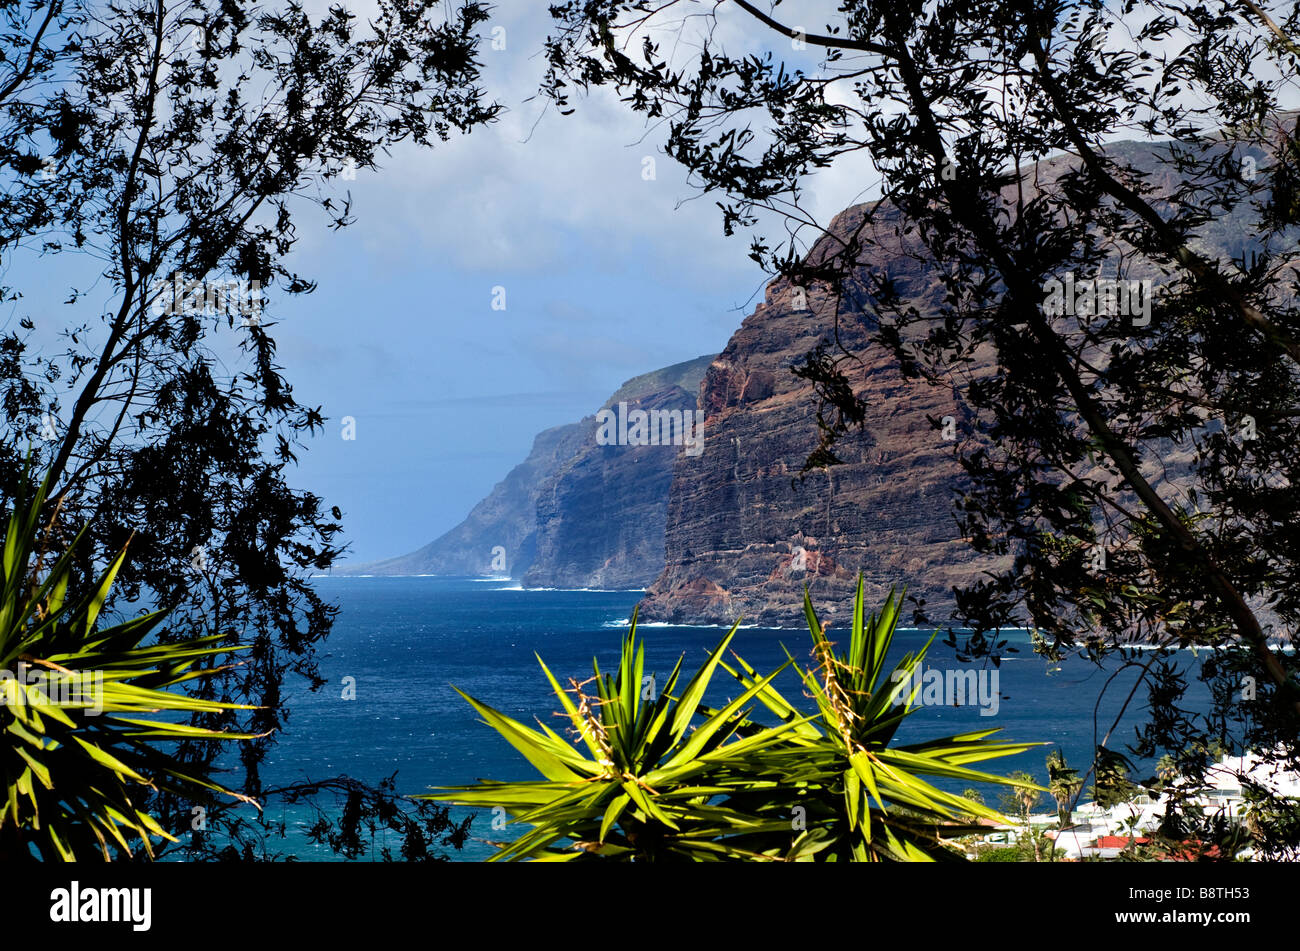 Los Gigantes-Teneriffa-Kanarische Inseln Spanien Stockbild